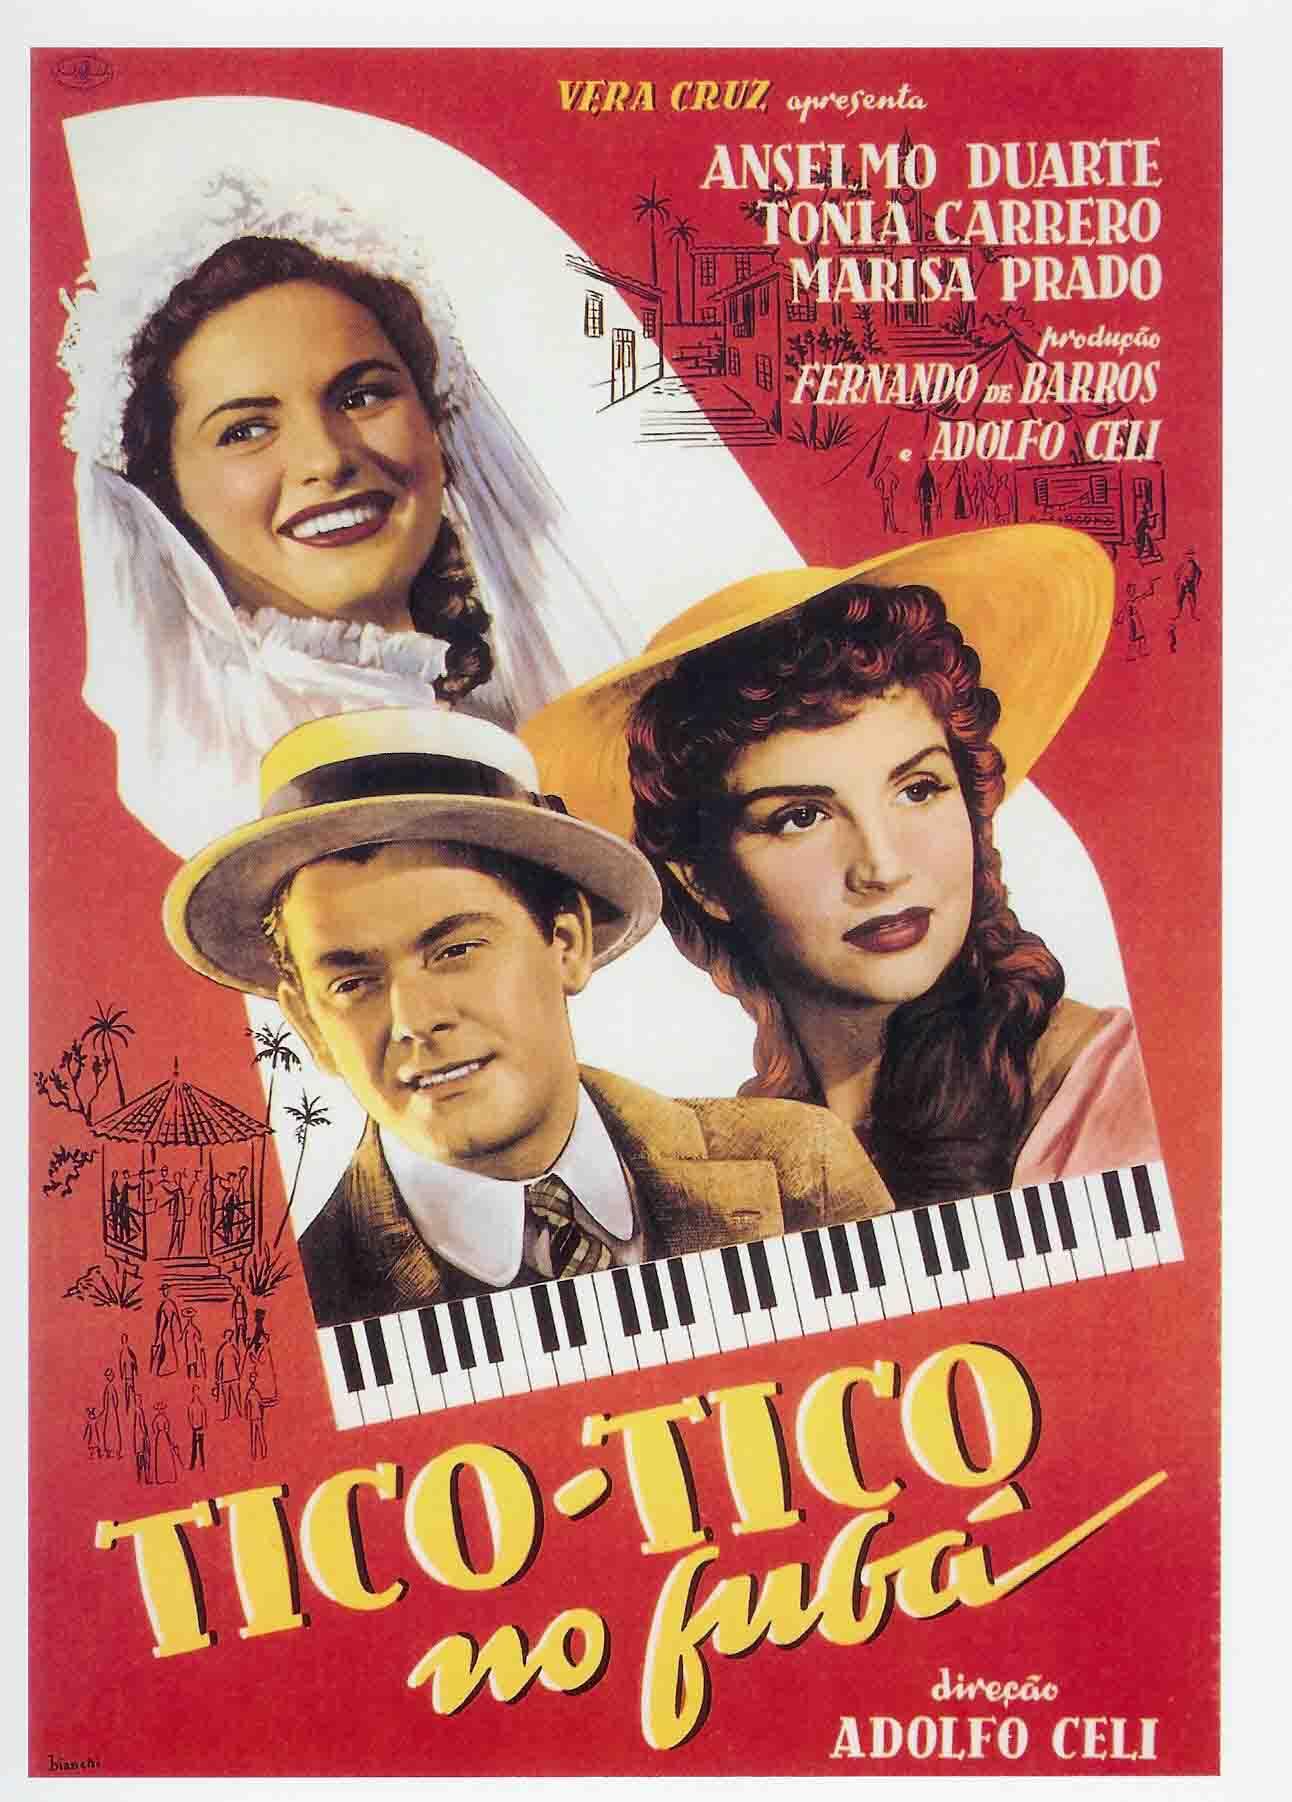 Tico-Tico no Fubá [Nac] – IMDB 6.3